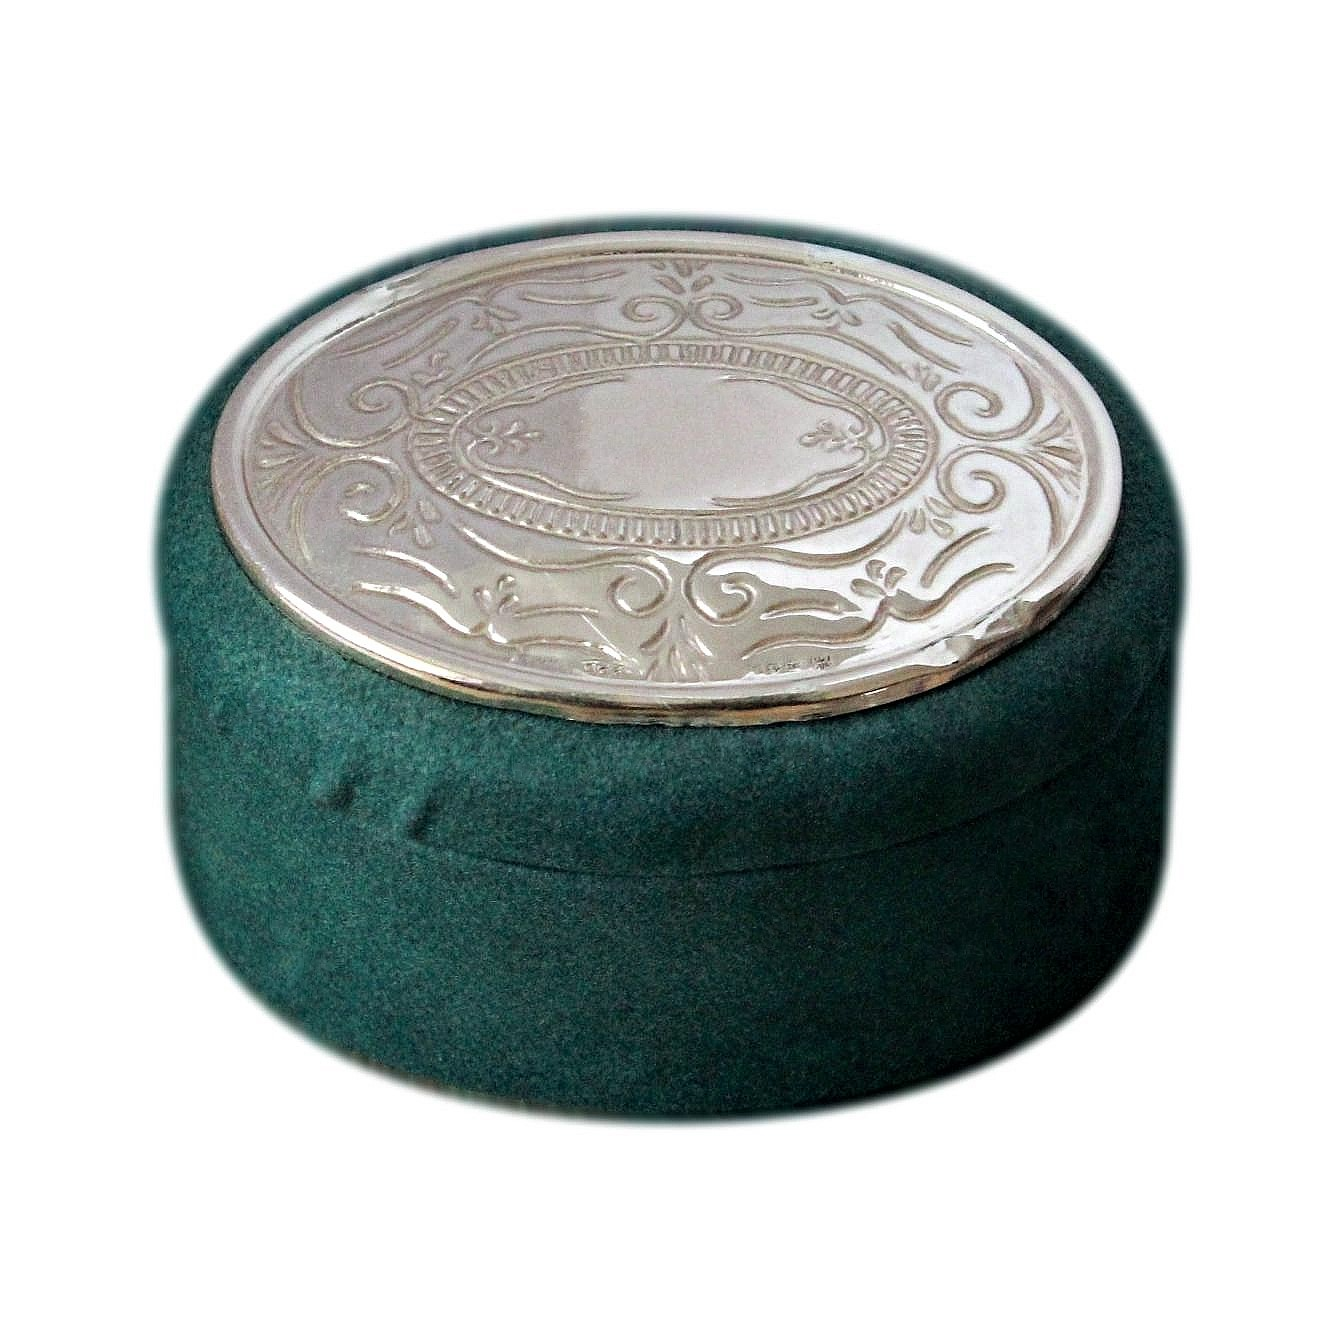 Small Italian Jewellery Box With Hallmarked Silver Lid